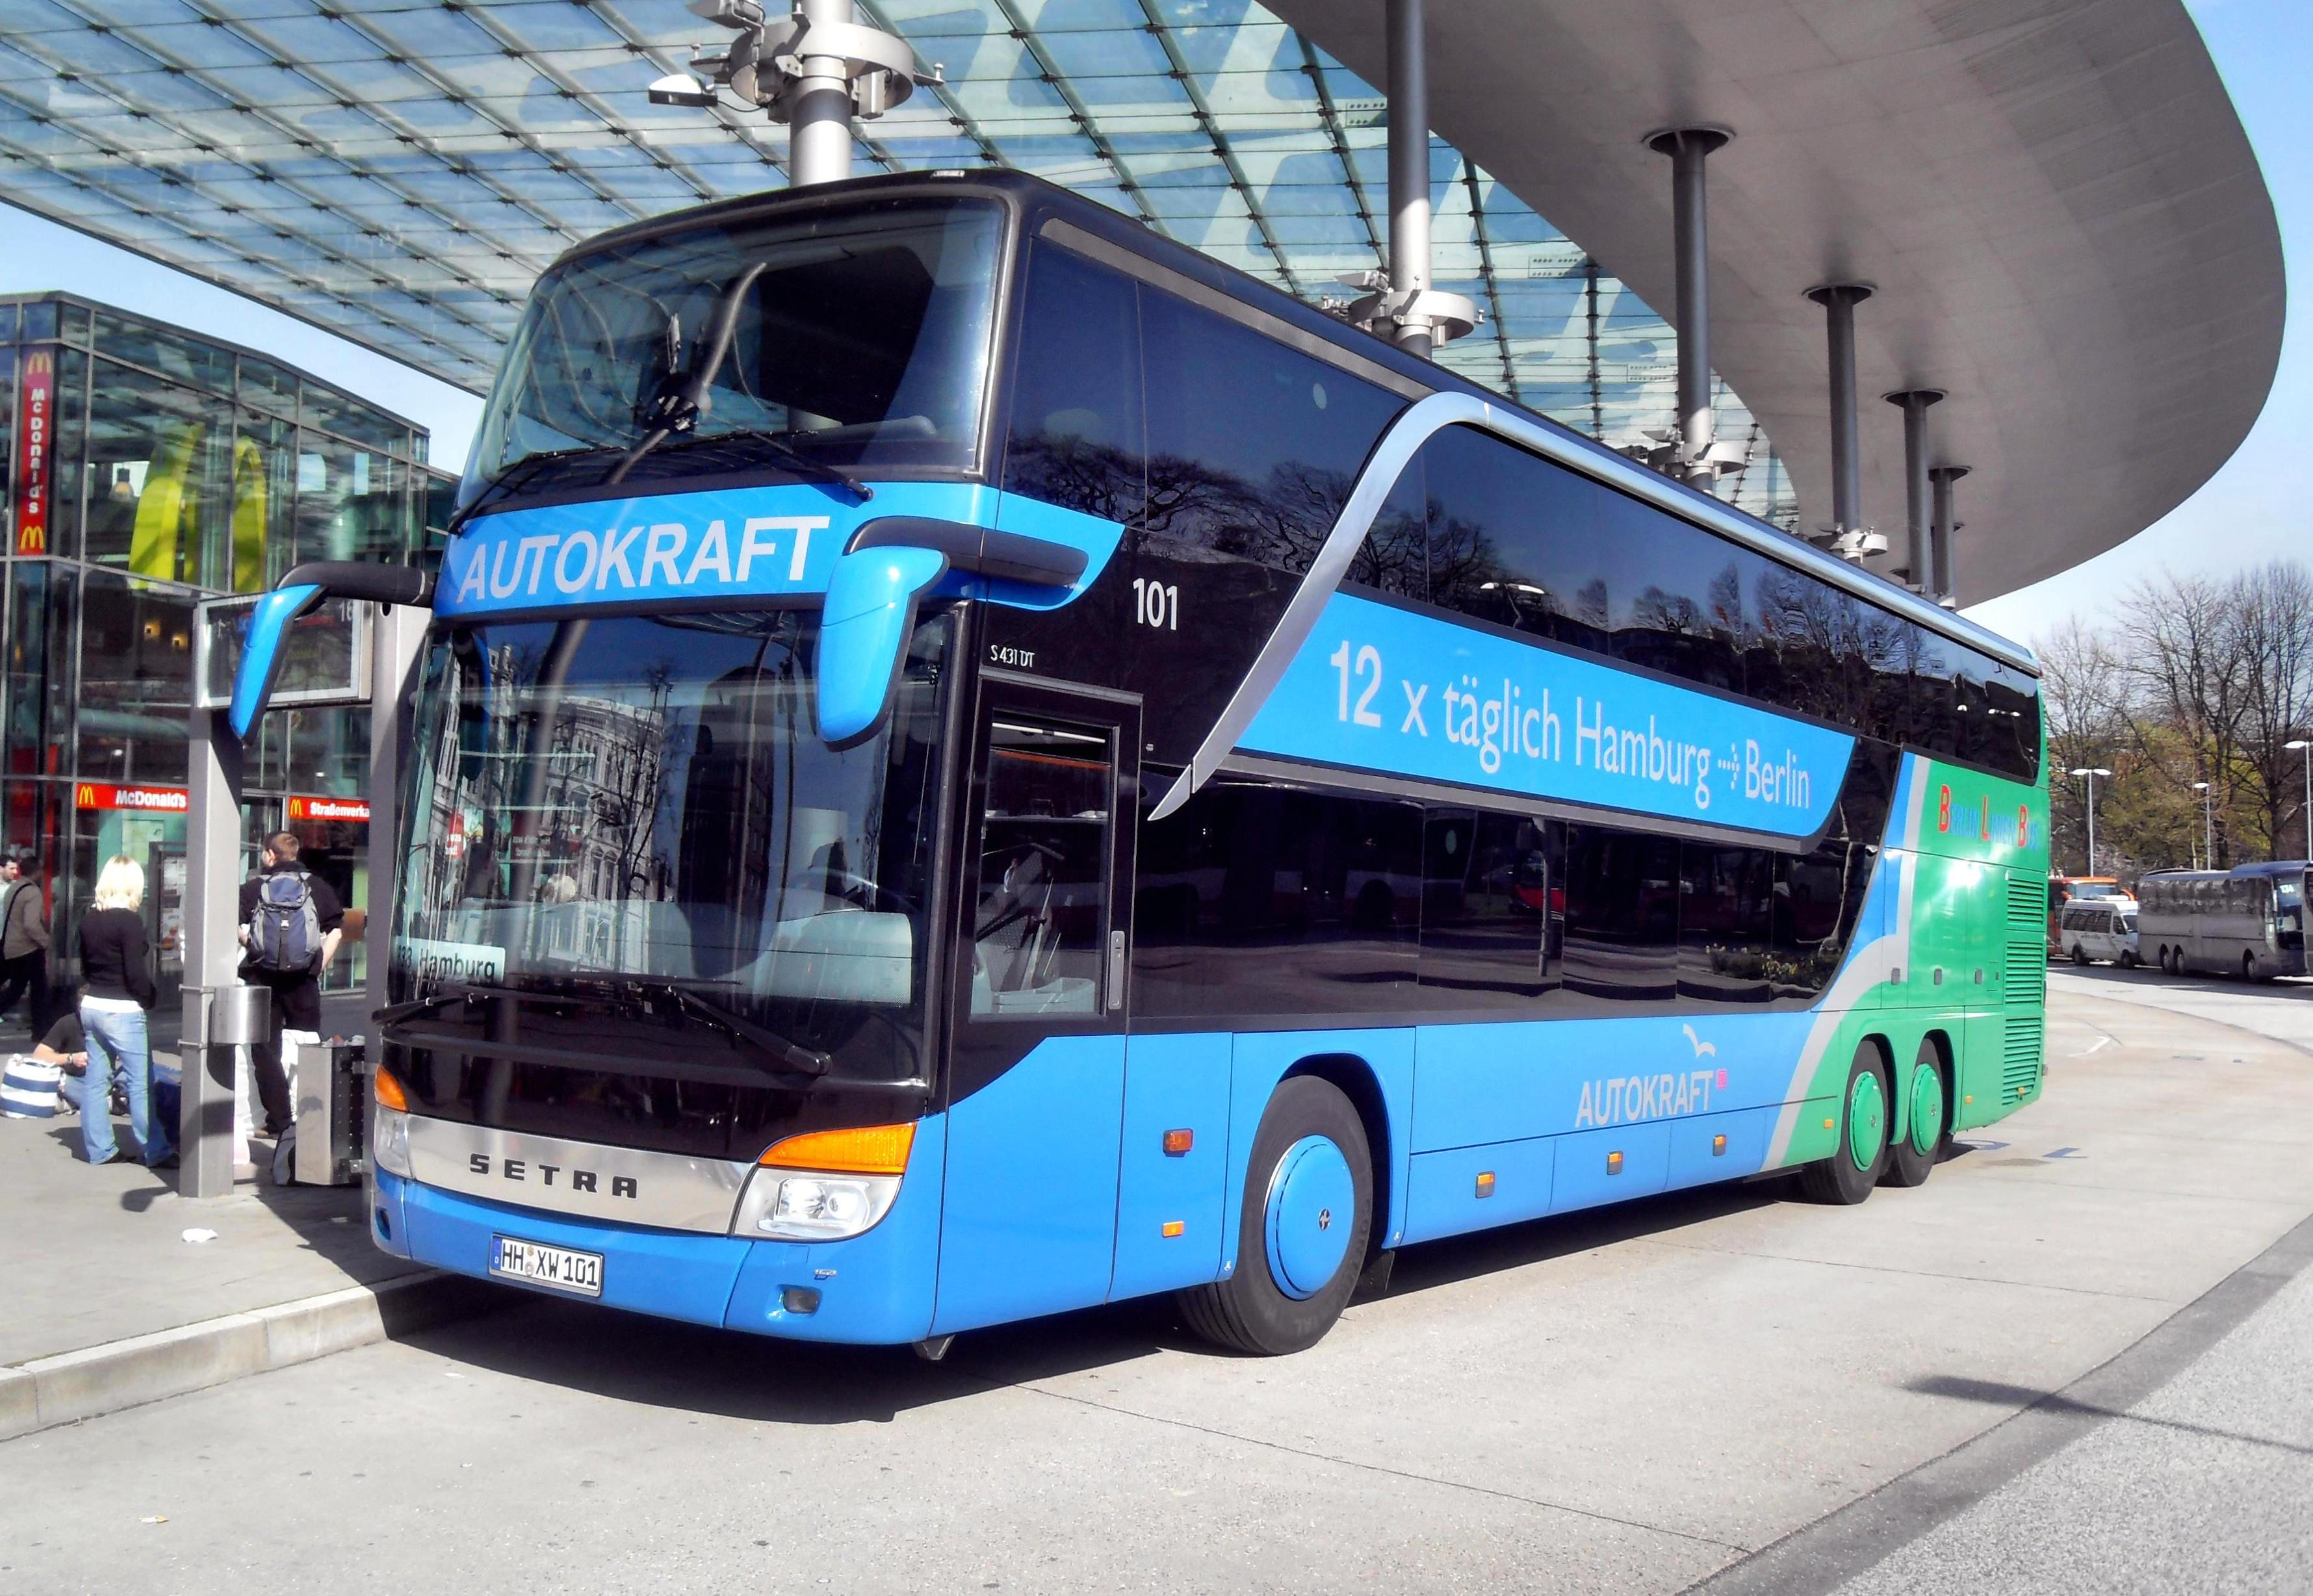 datei hamburger zob autokraft bus setra hh xw 101 berlin linien bus 9 wikipedia. Black Bedroom Furniture Sets. Home Design Ideas